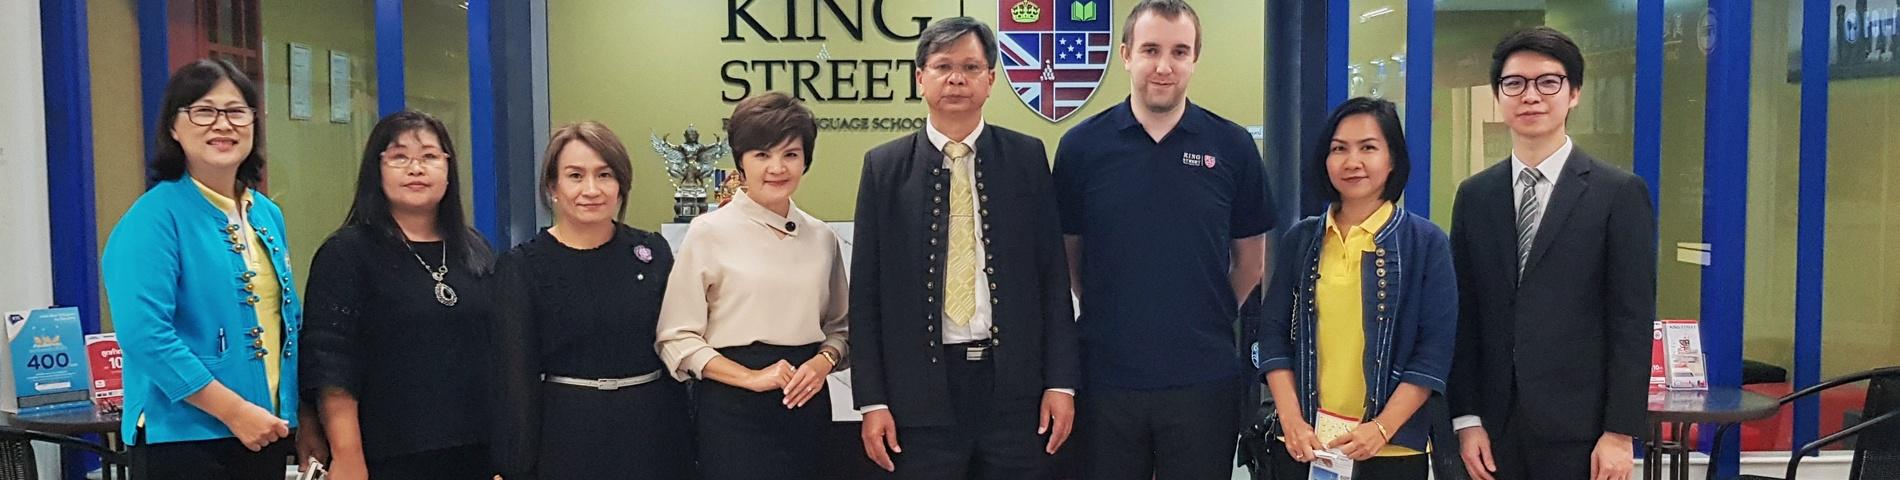 King Street English Language School зображення 1